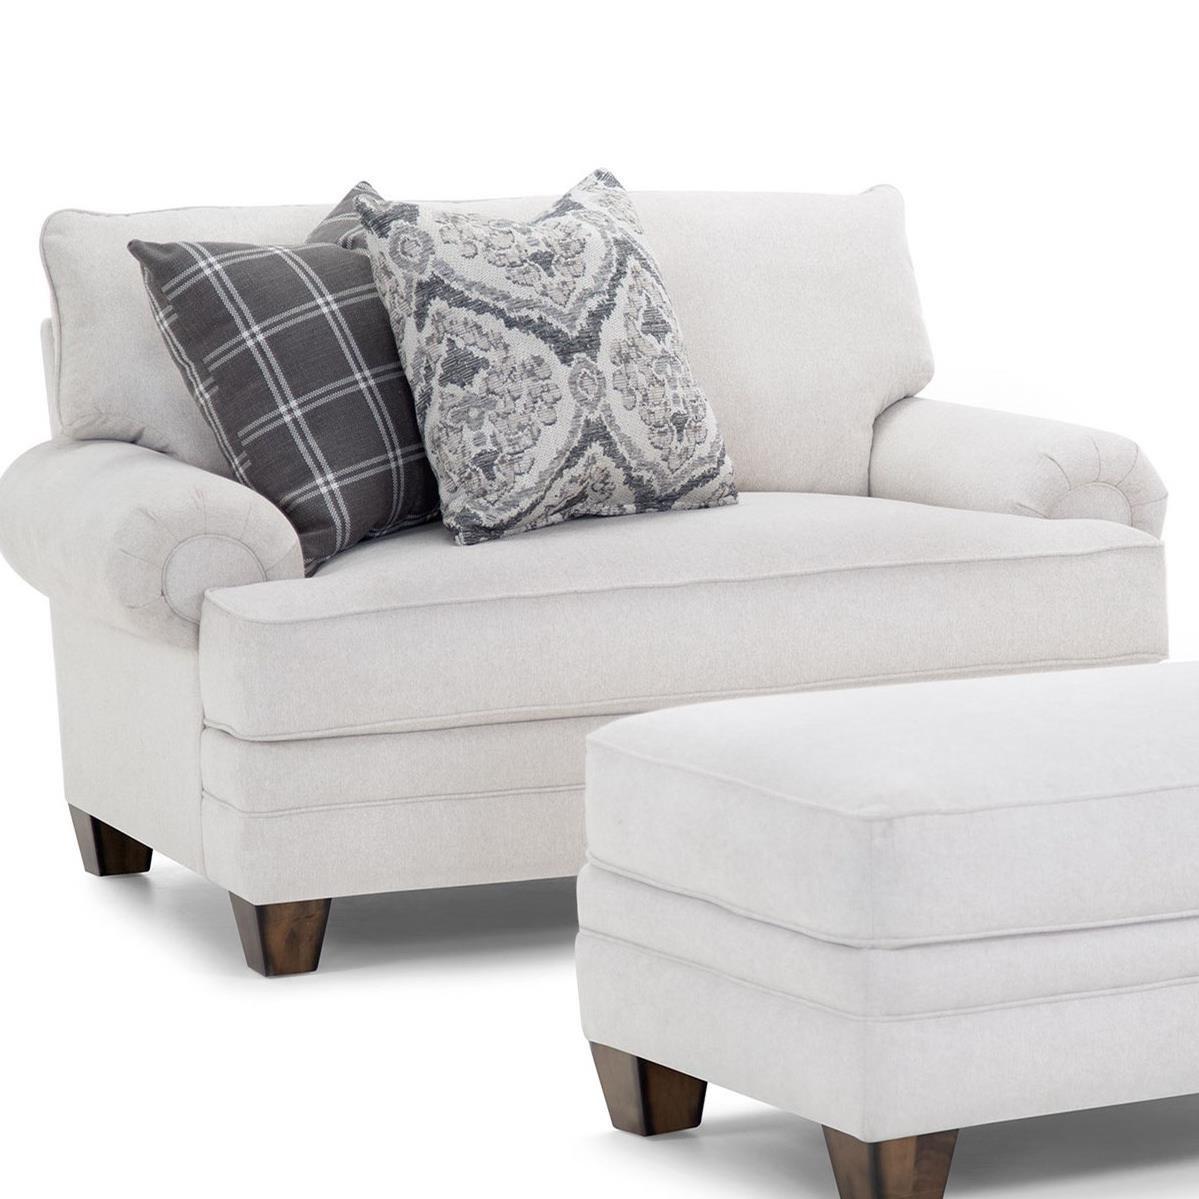 957 Chair and a Half by Franklin at Furniture Fair - North Carolina